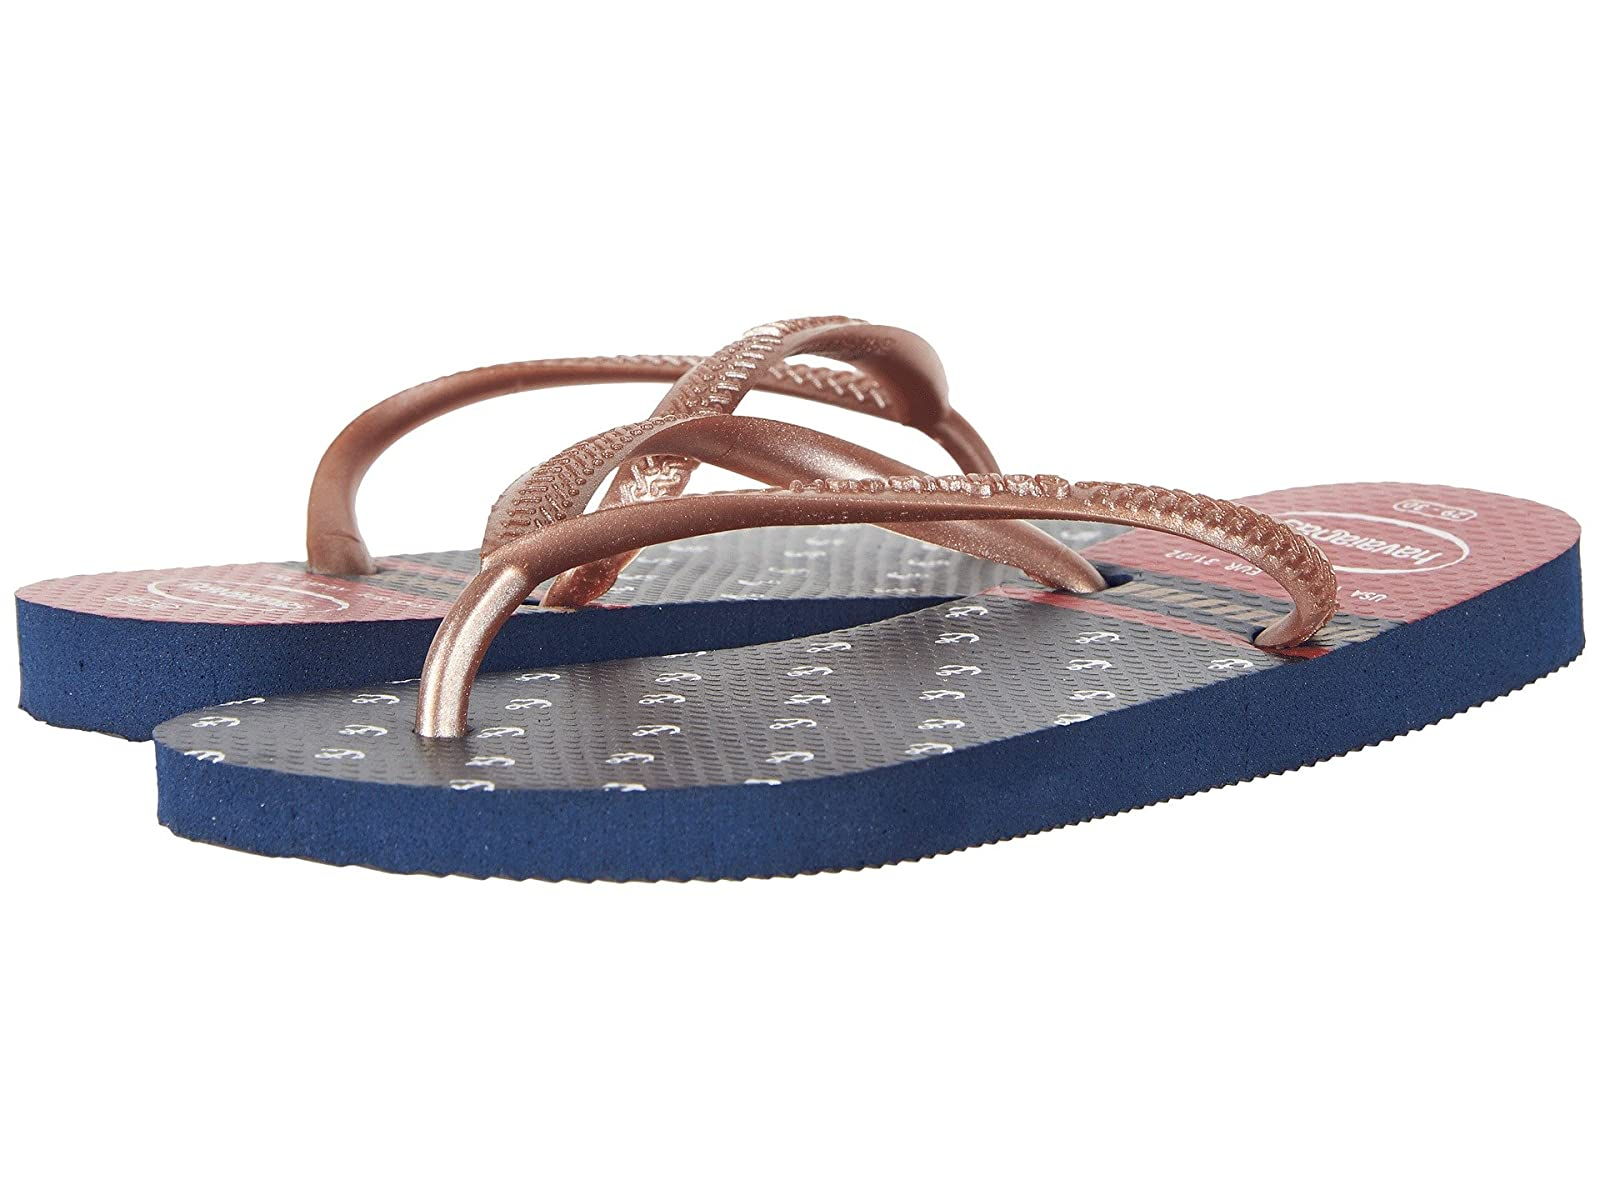 Havaianas Kids Slim Nautical Flip-Flop (Toddler/Little Kid/Big Kid)Atmospheric grades have affordable shoes